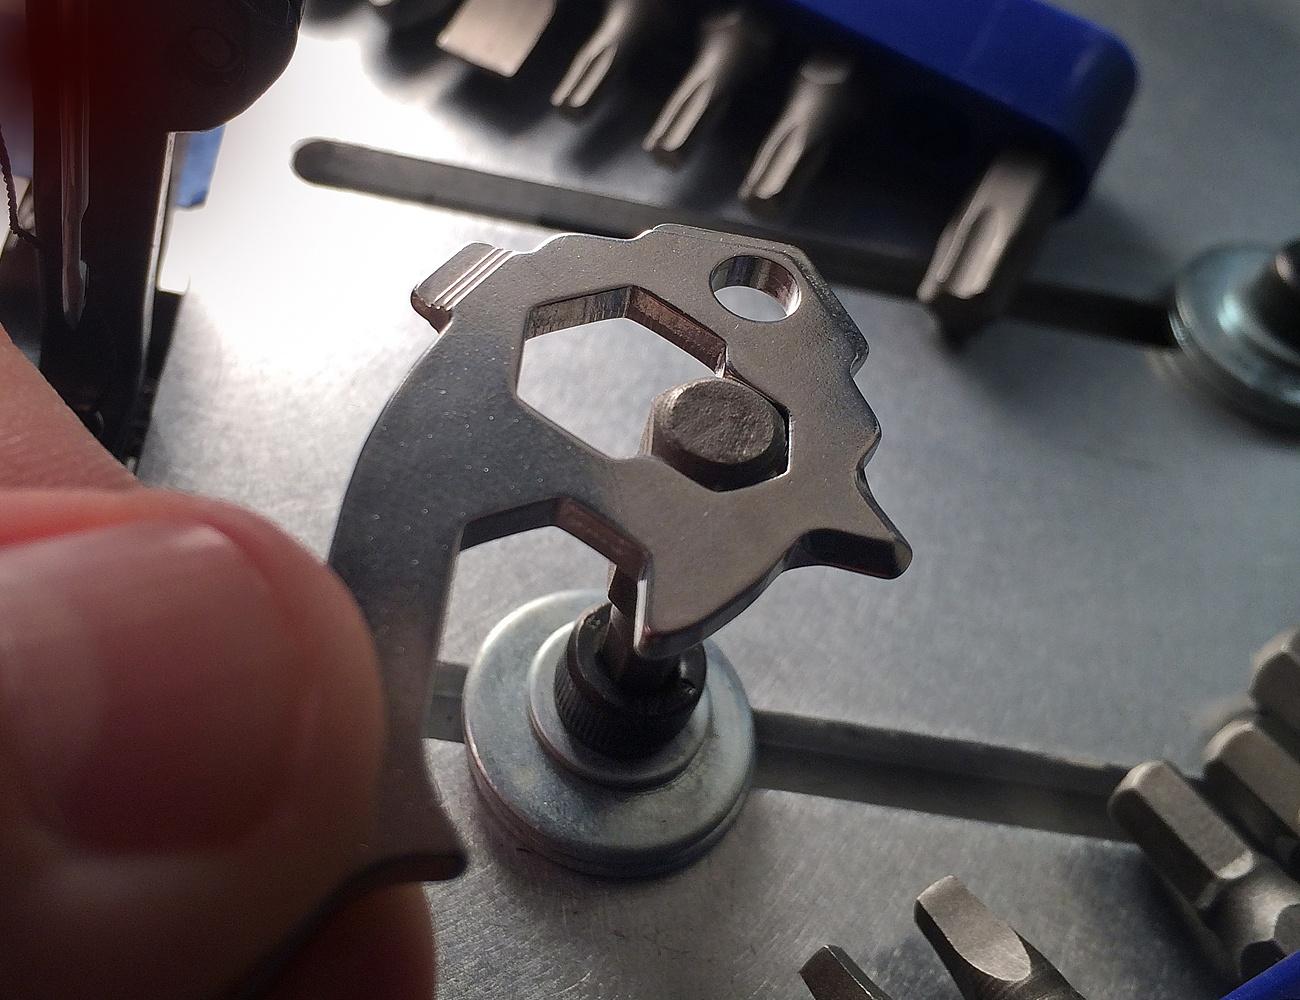 The MSTR KEY 20-in-1 Multi-Tool Keytool